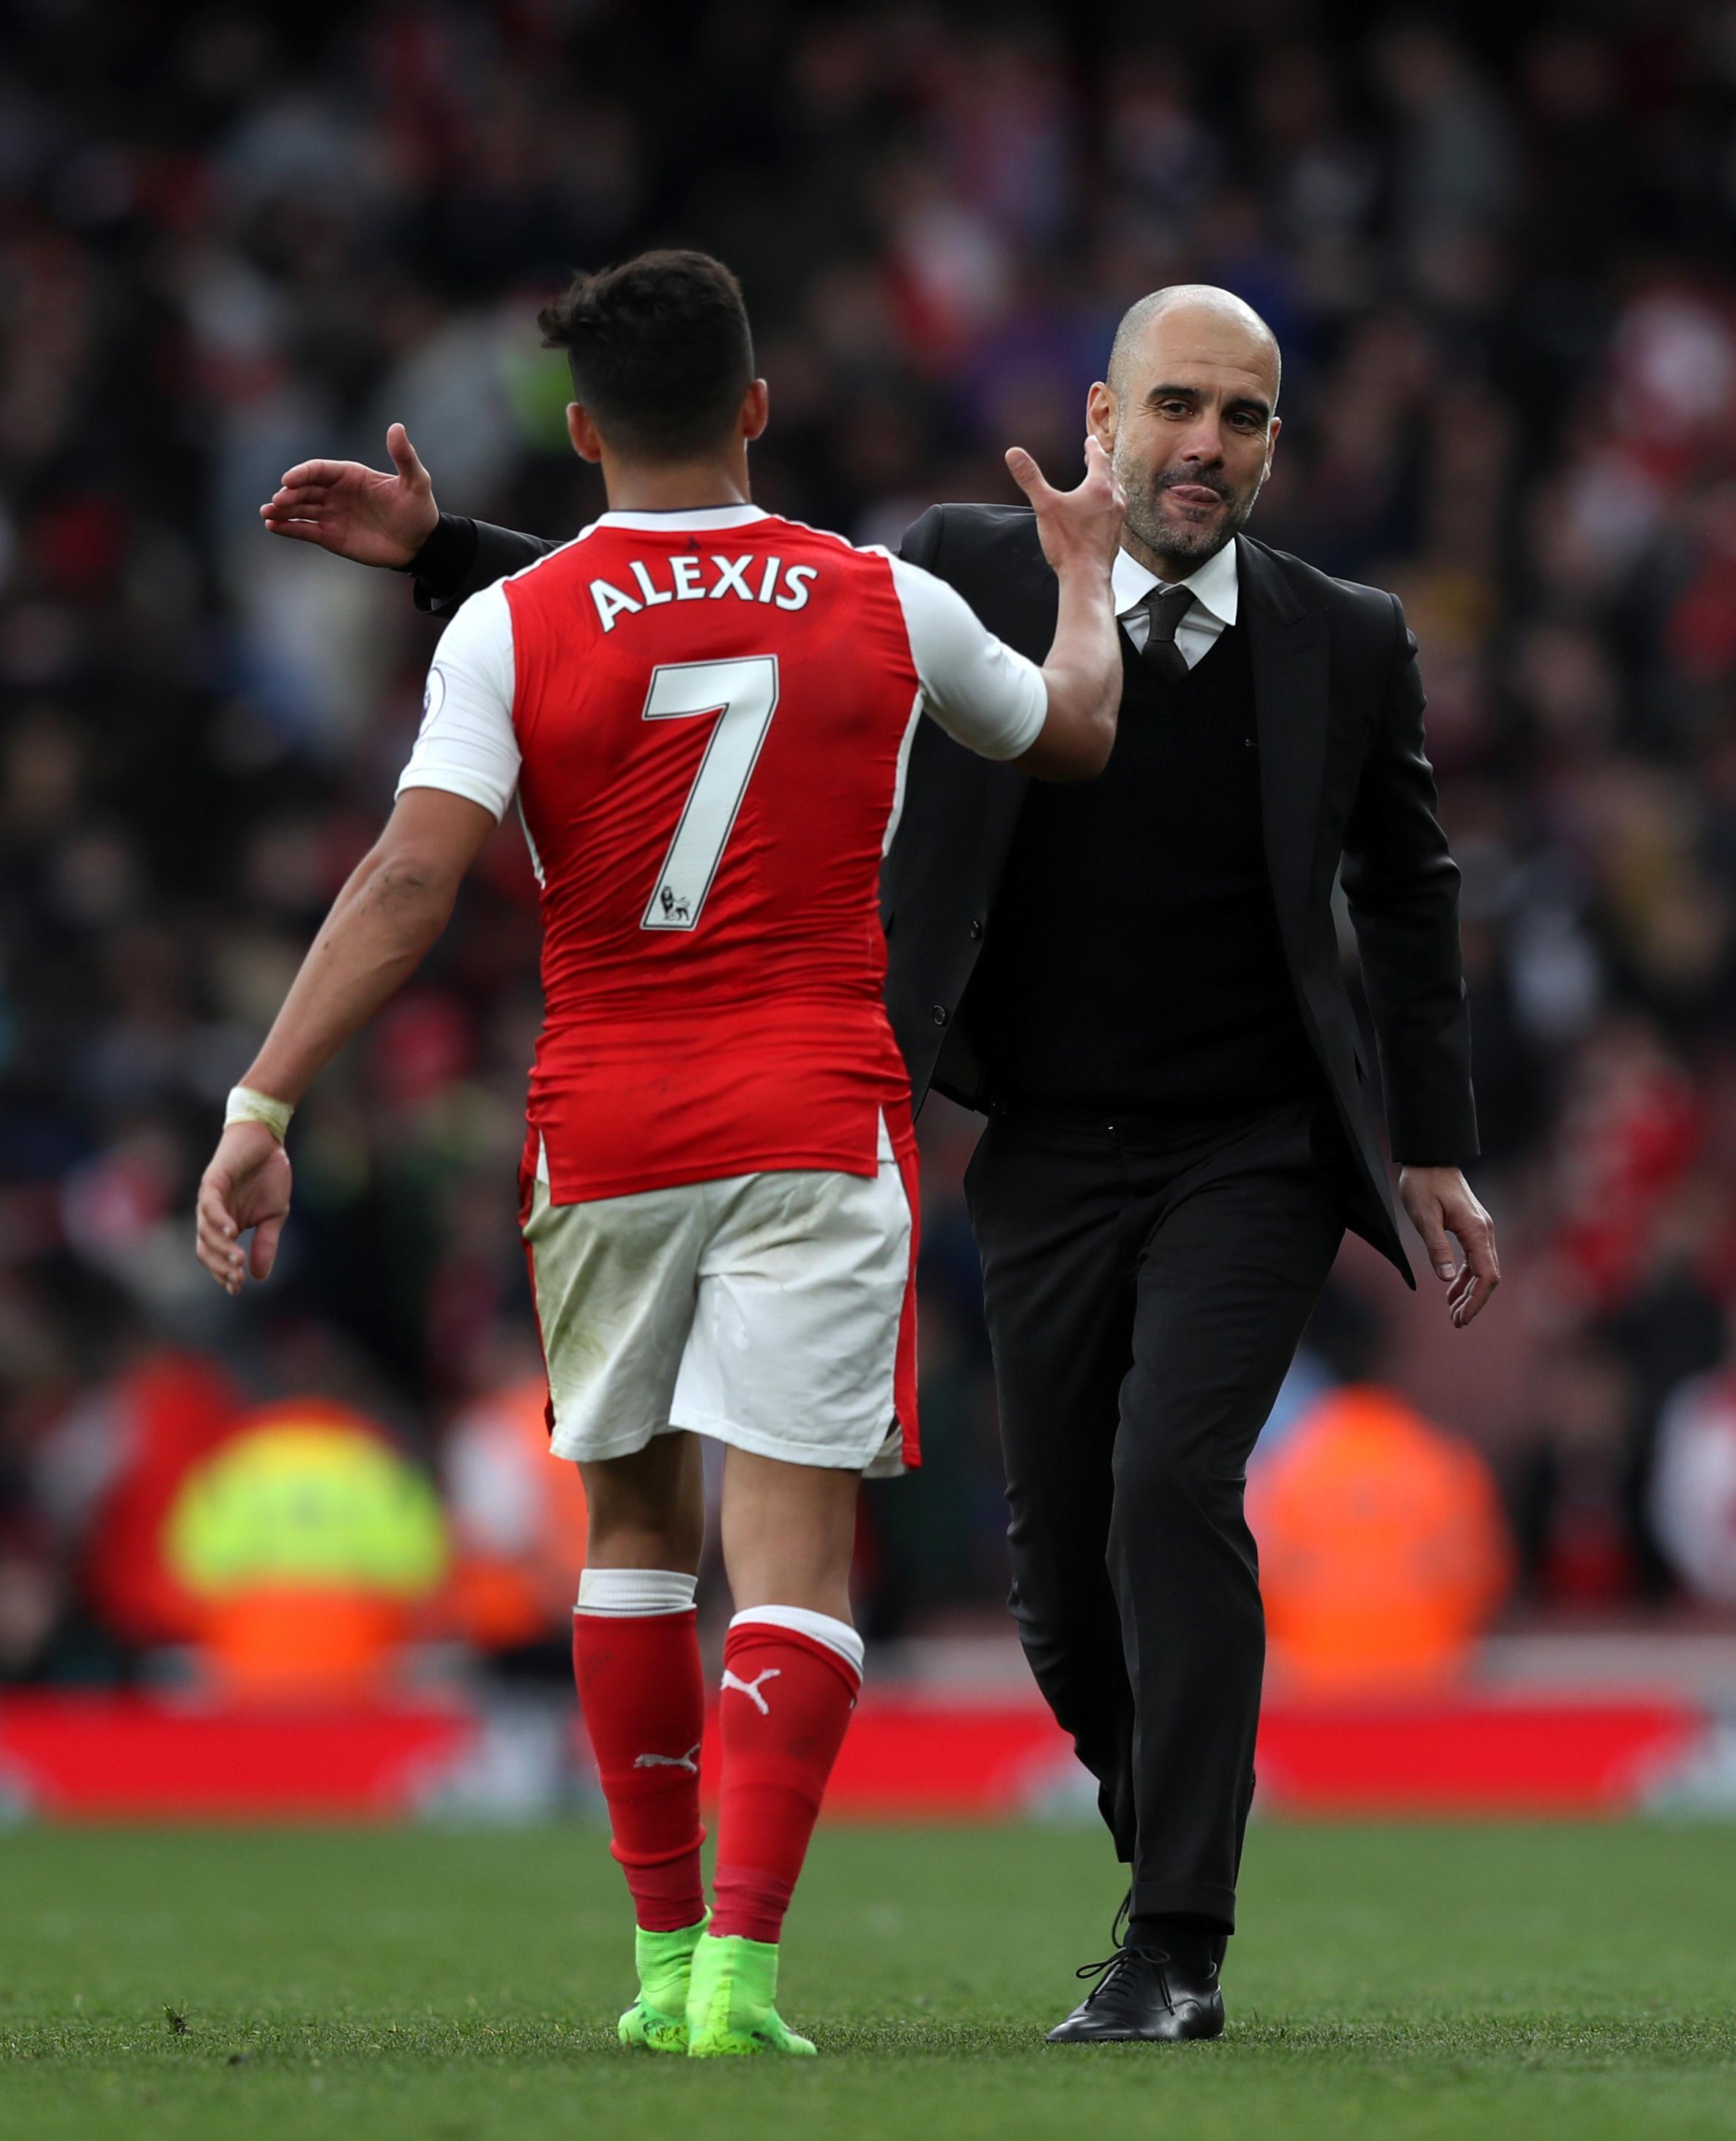 Guardiola has had his eye on Sanchez since the summer